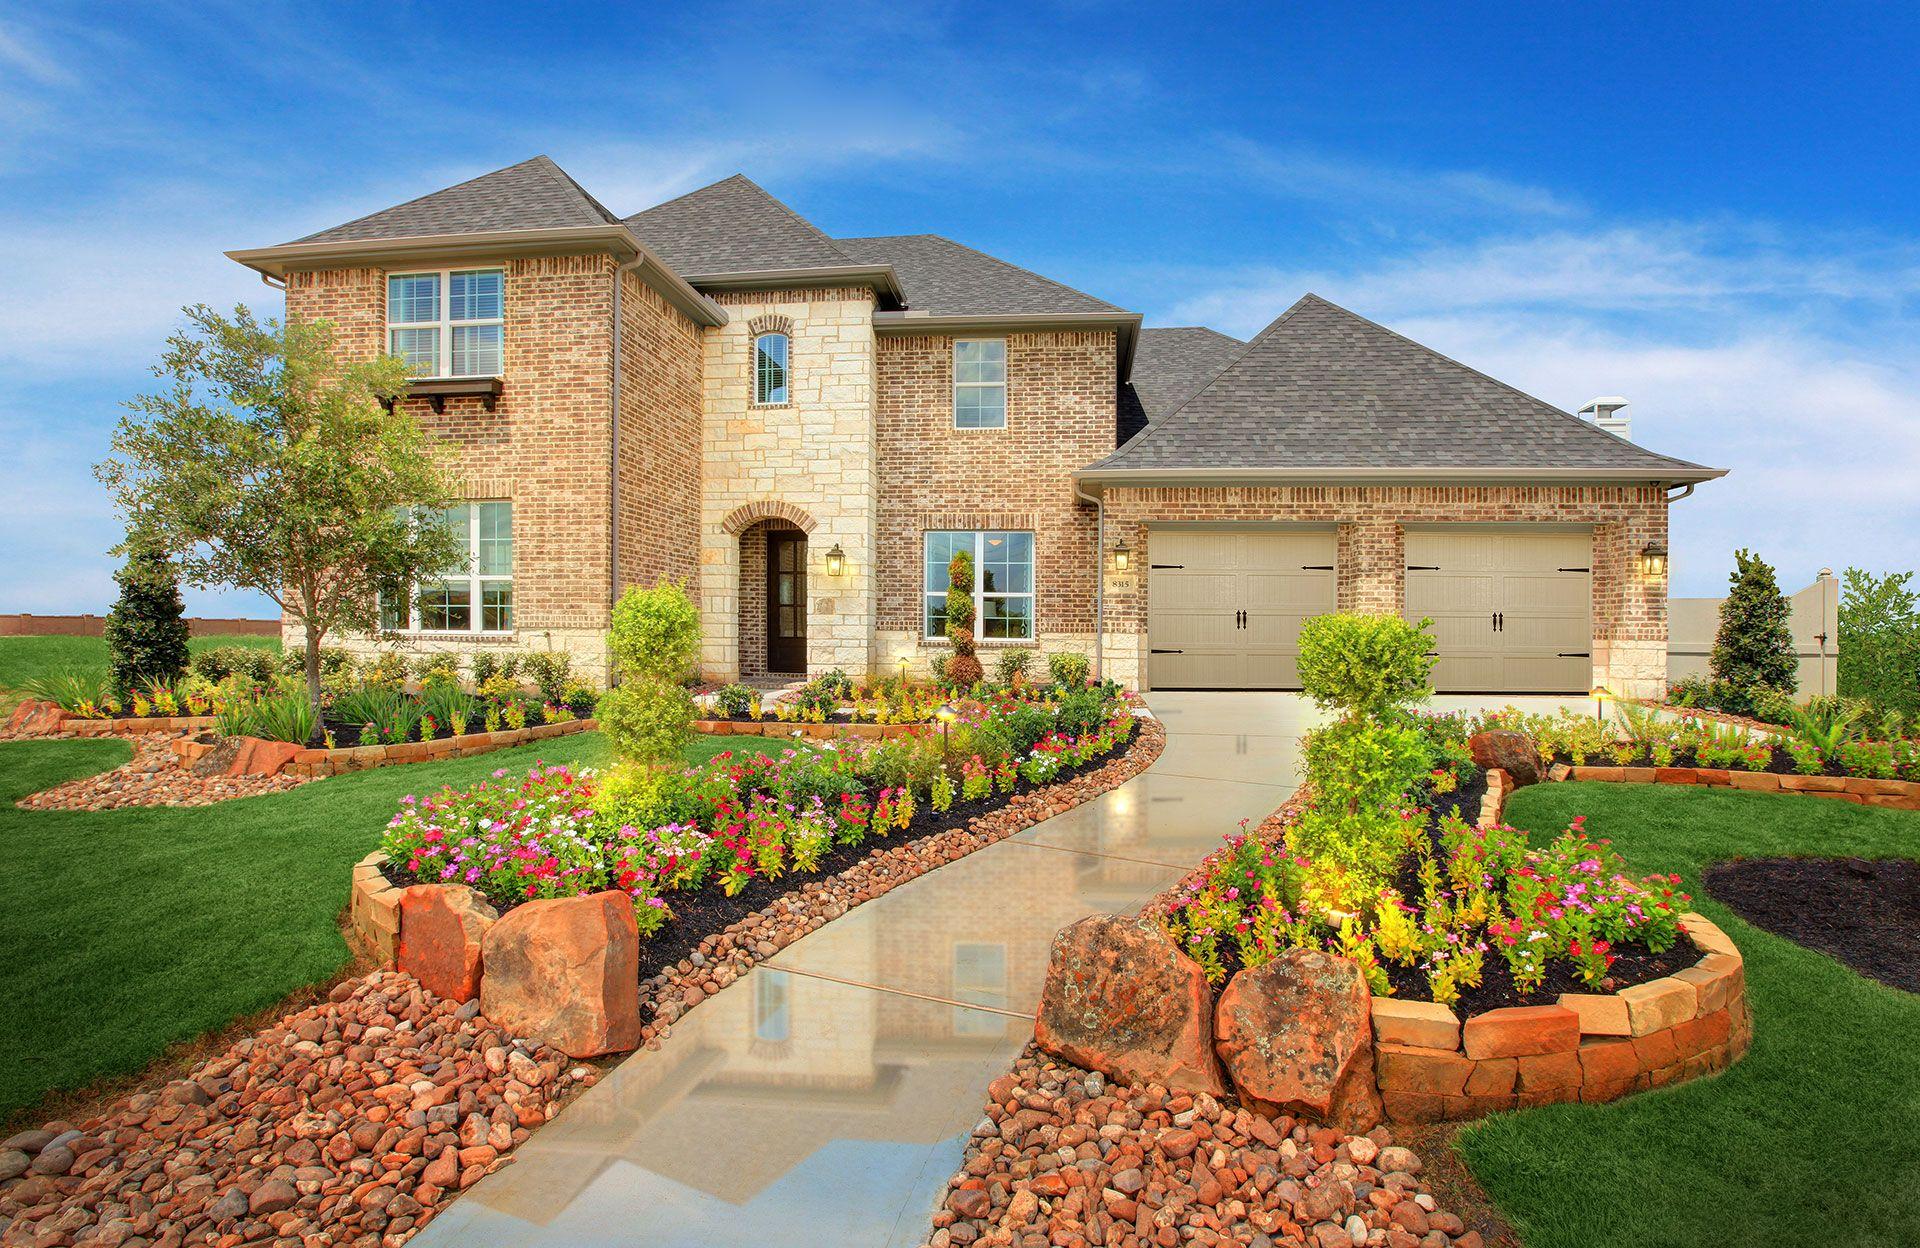 Unifamiliar por un Venta en Crestmoore 8315 Summer Breeze Lane Rosenberg, Texas 77469 United States